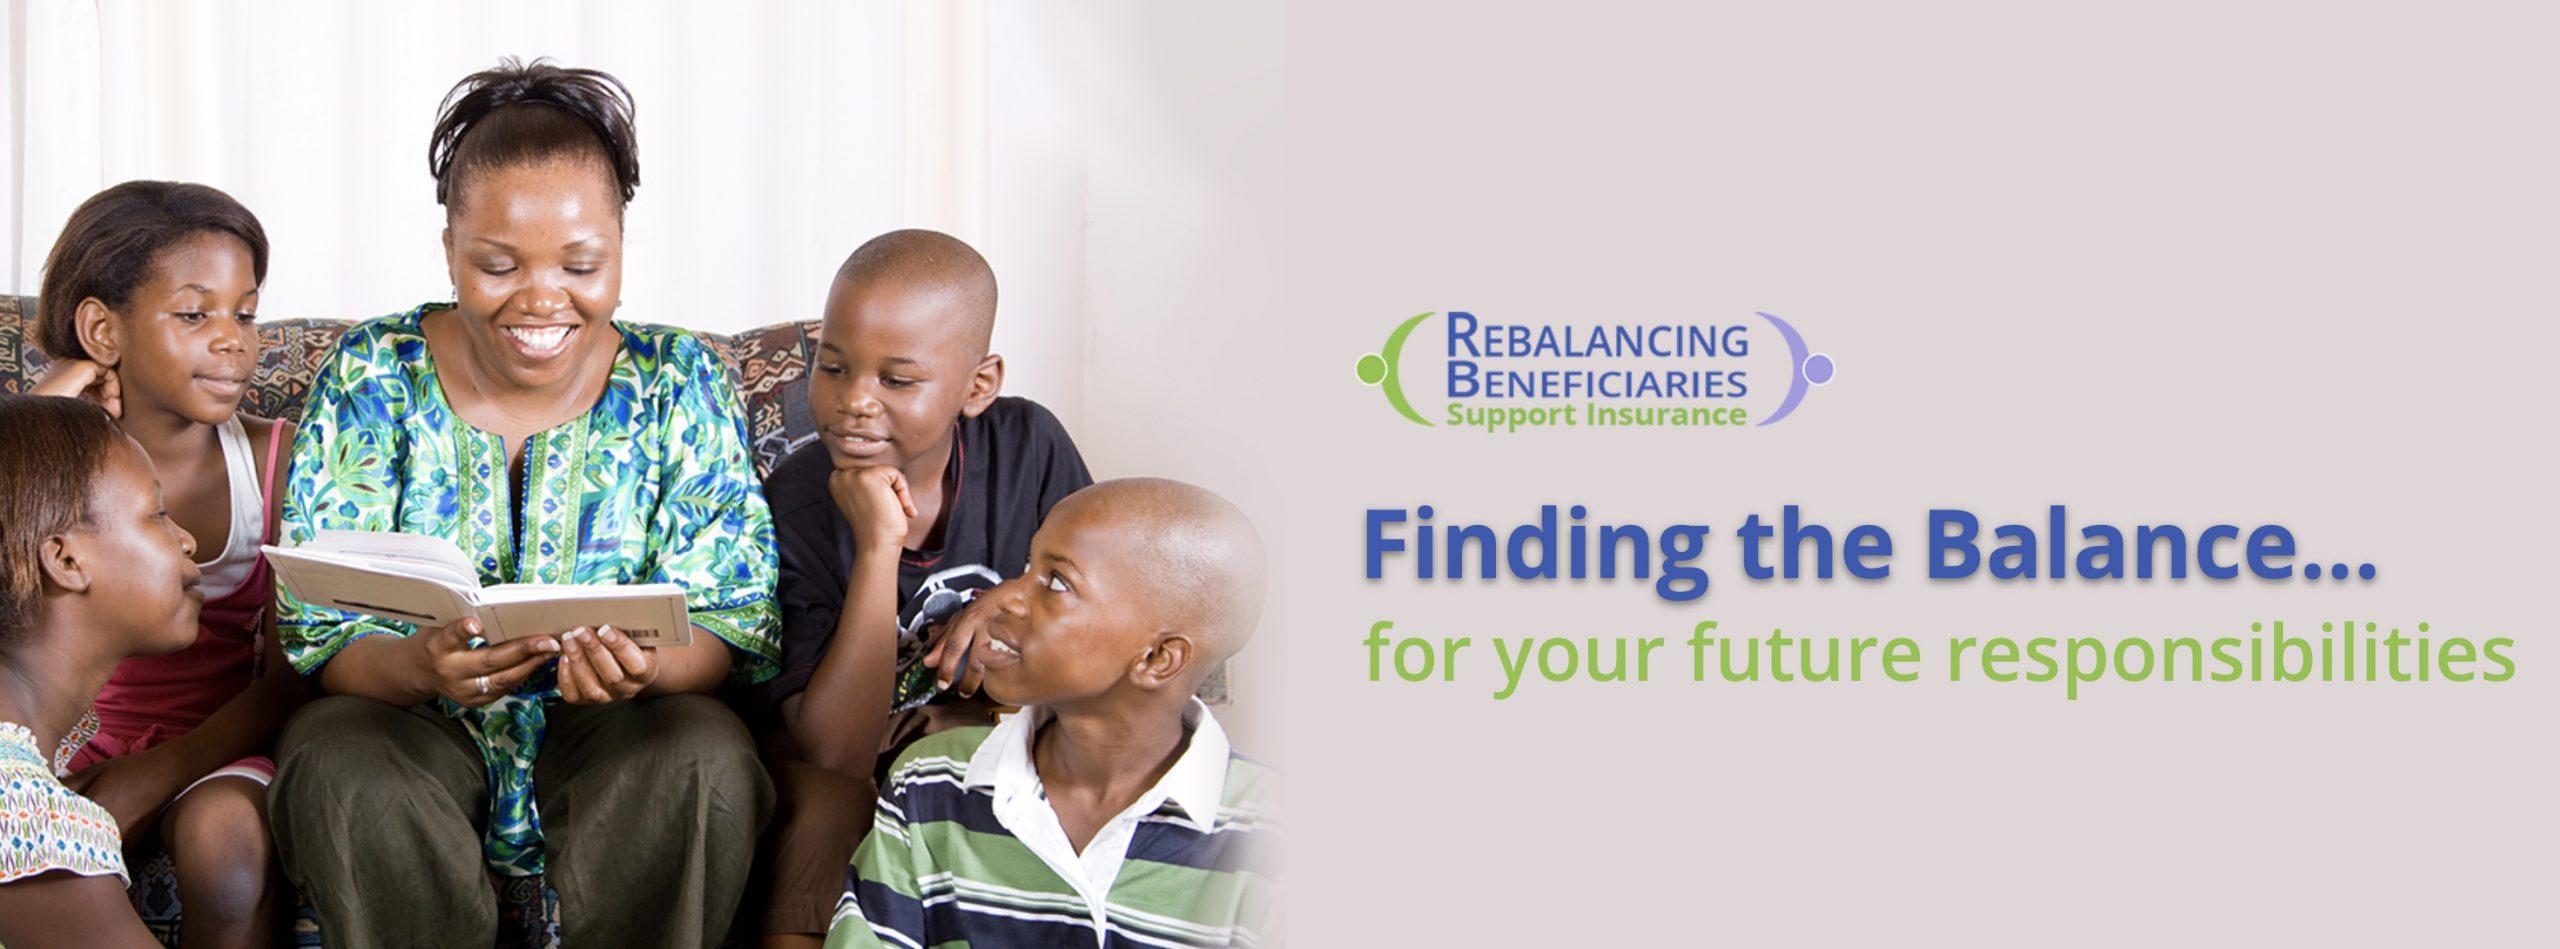 rebalancing-beneficiaries-support-insurance-RBSI